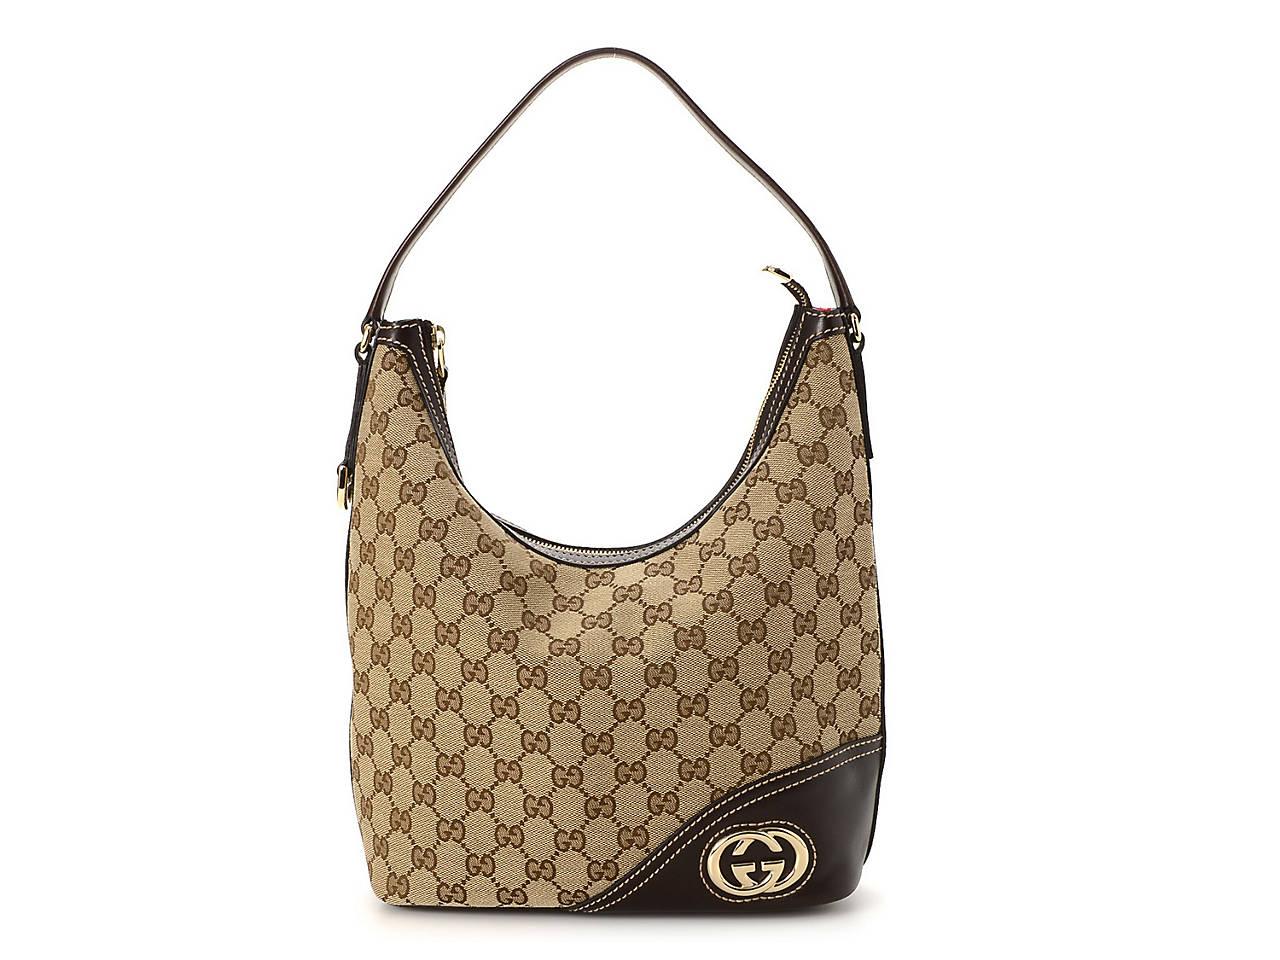 c3c39731869 Gucci - Vintage Luxury GG Canvas New Britt Shoulder Bag Women s ...